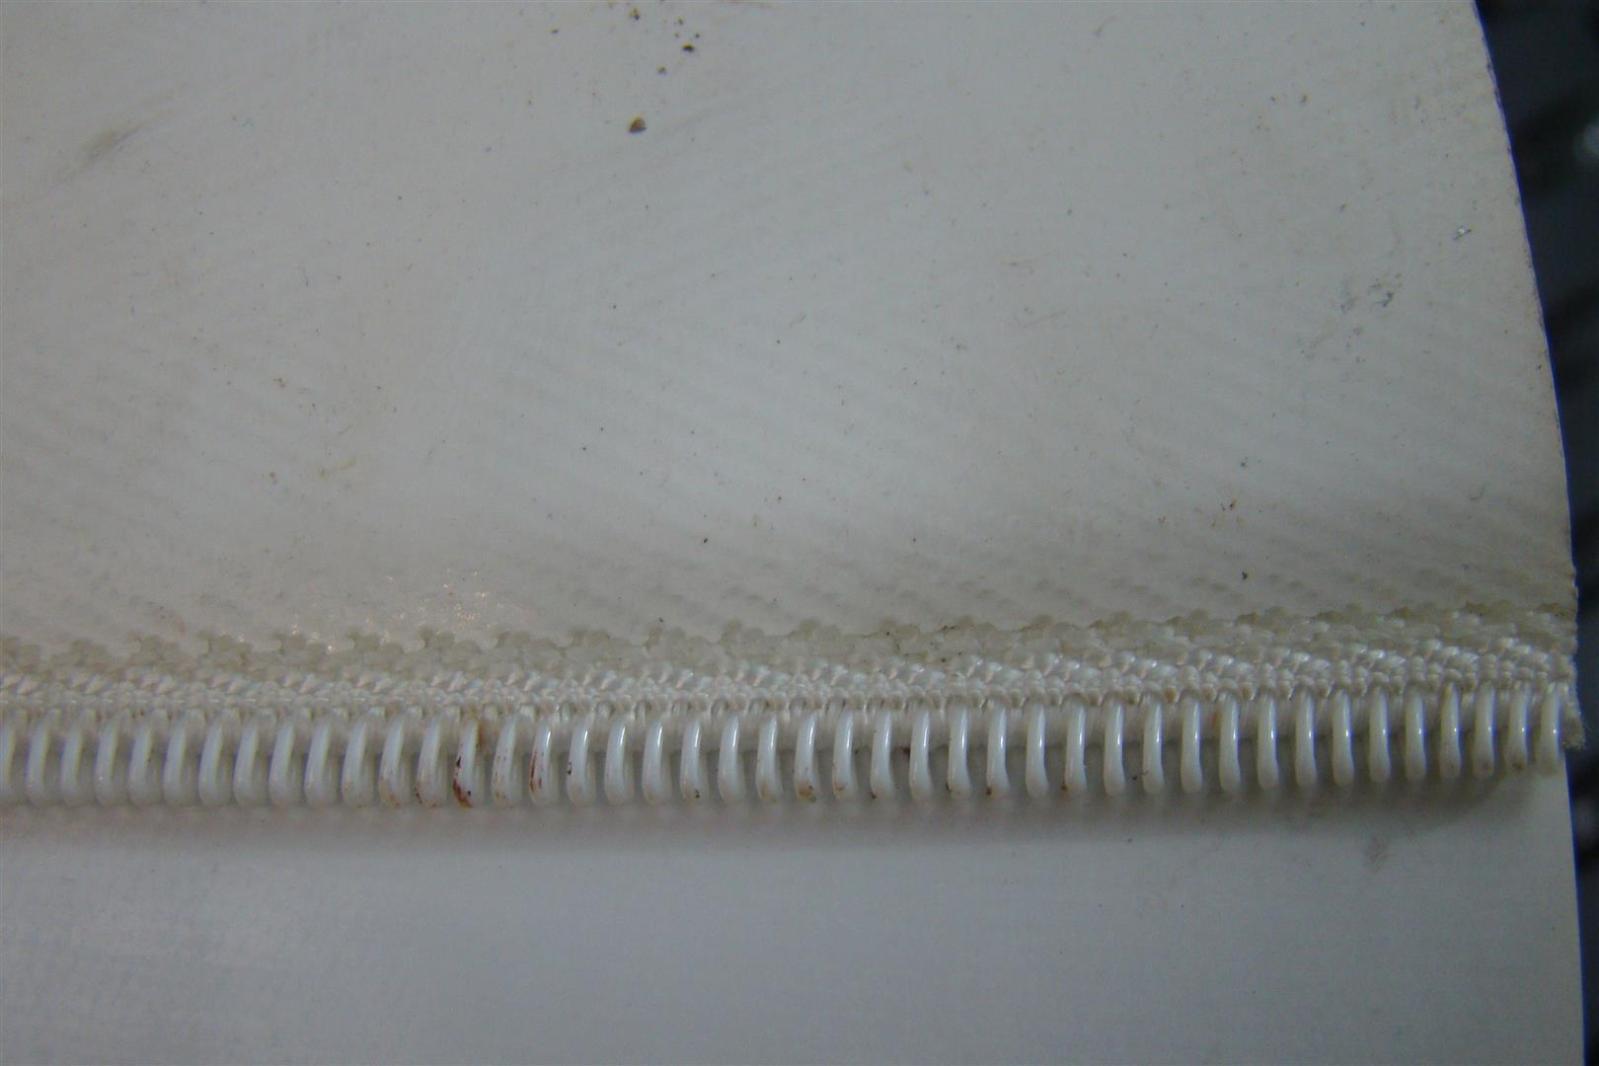 Ammeraal Beltech Ropanol Plastic Spiral Lace Conveyor Belt ...